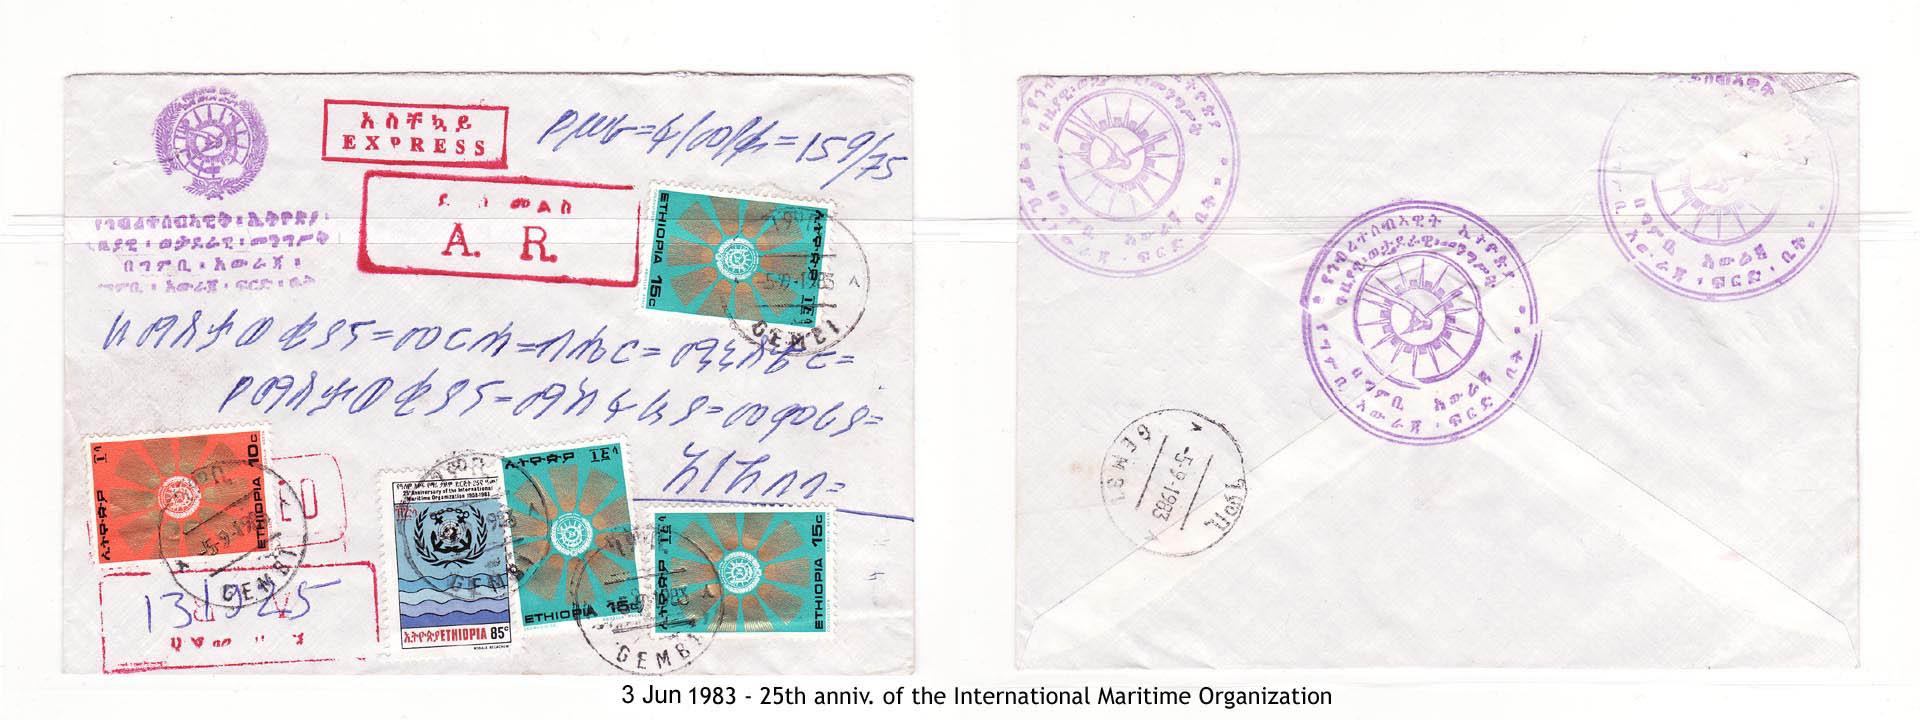 19830603 - 25th anniv. of the International Maritime Organization copy